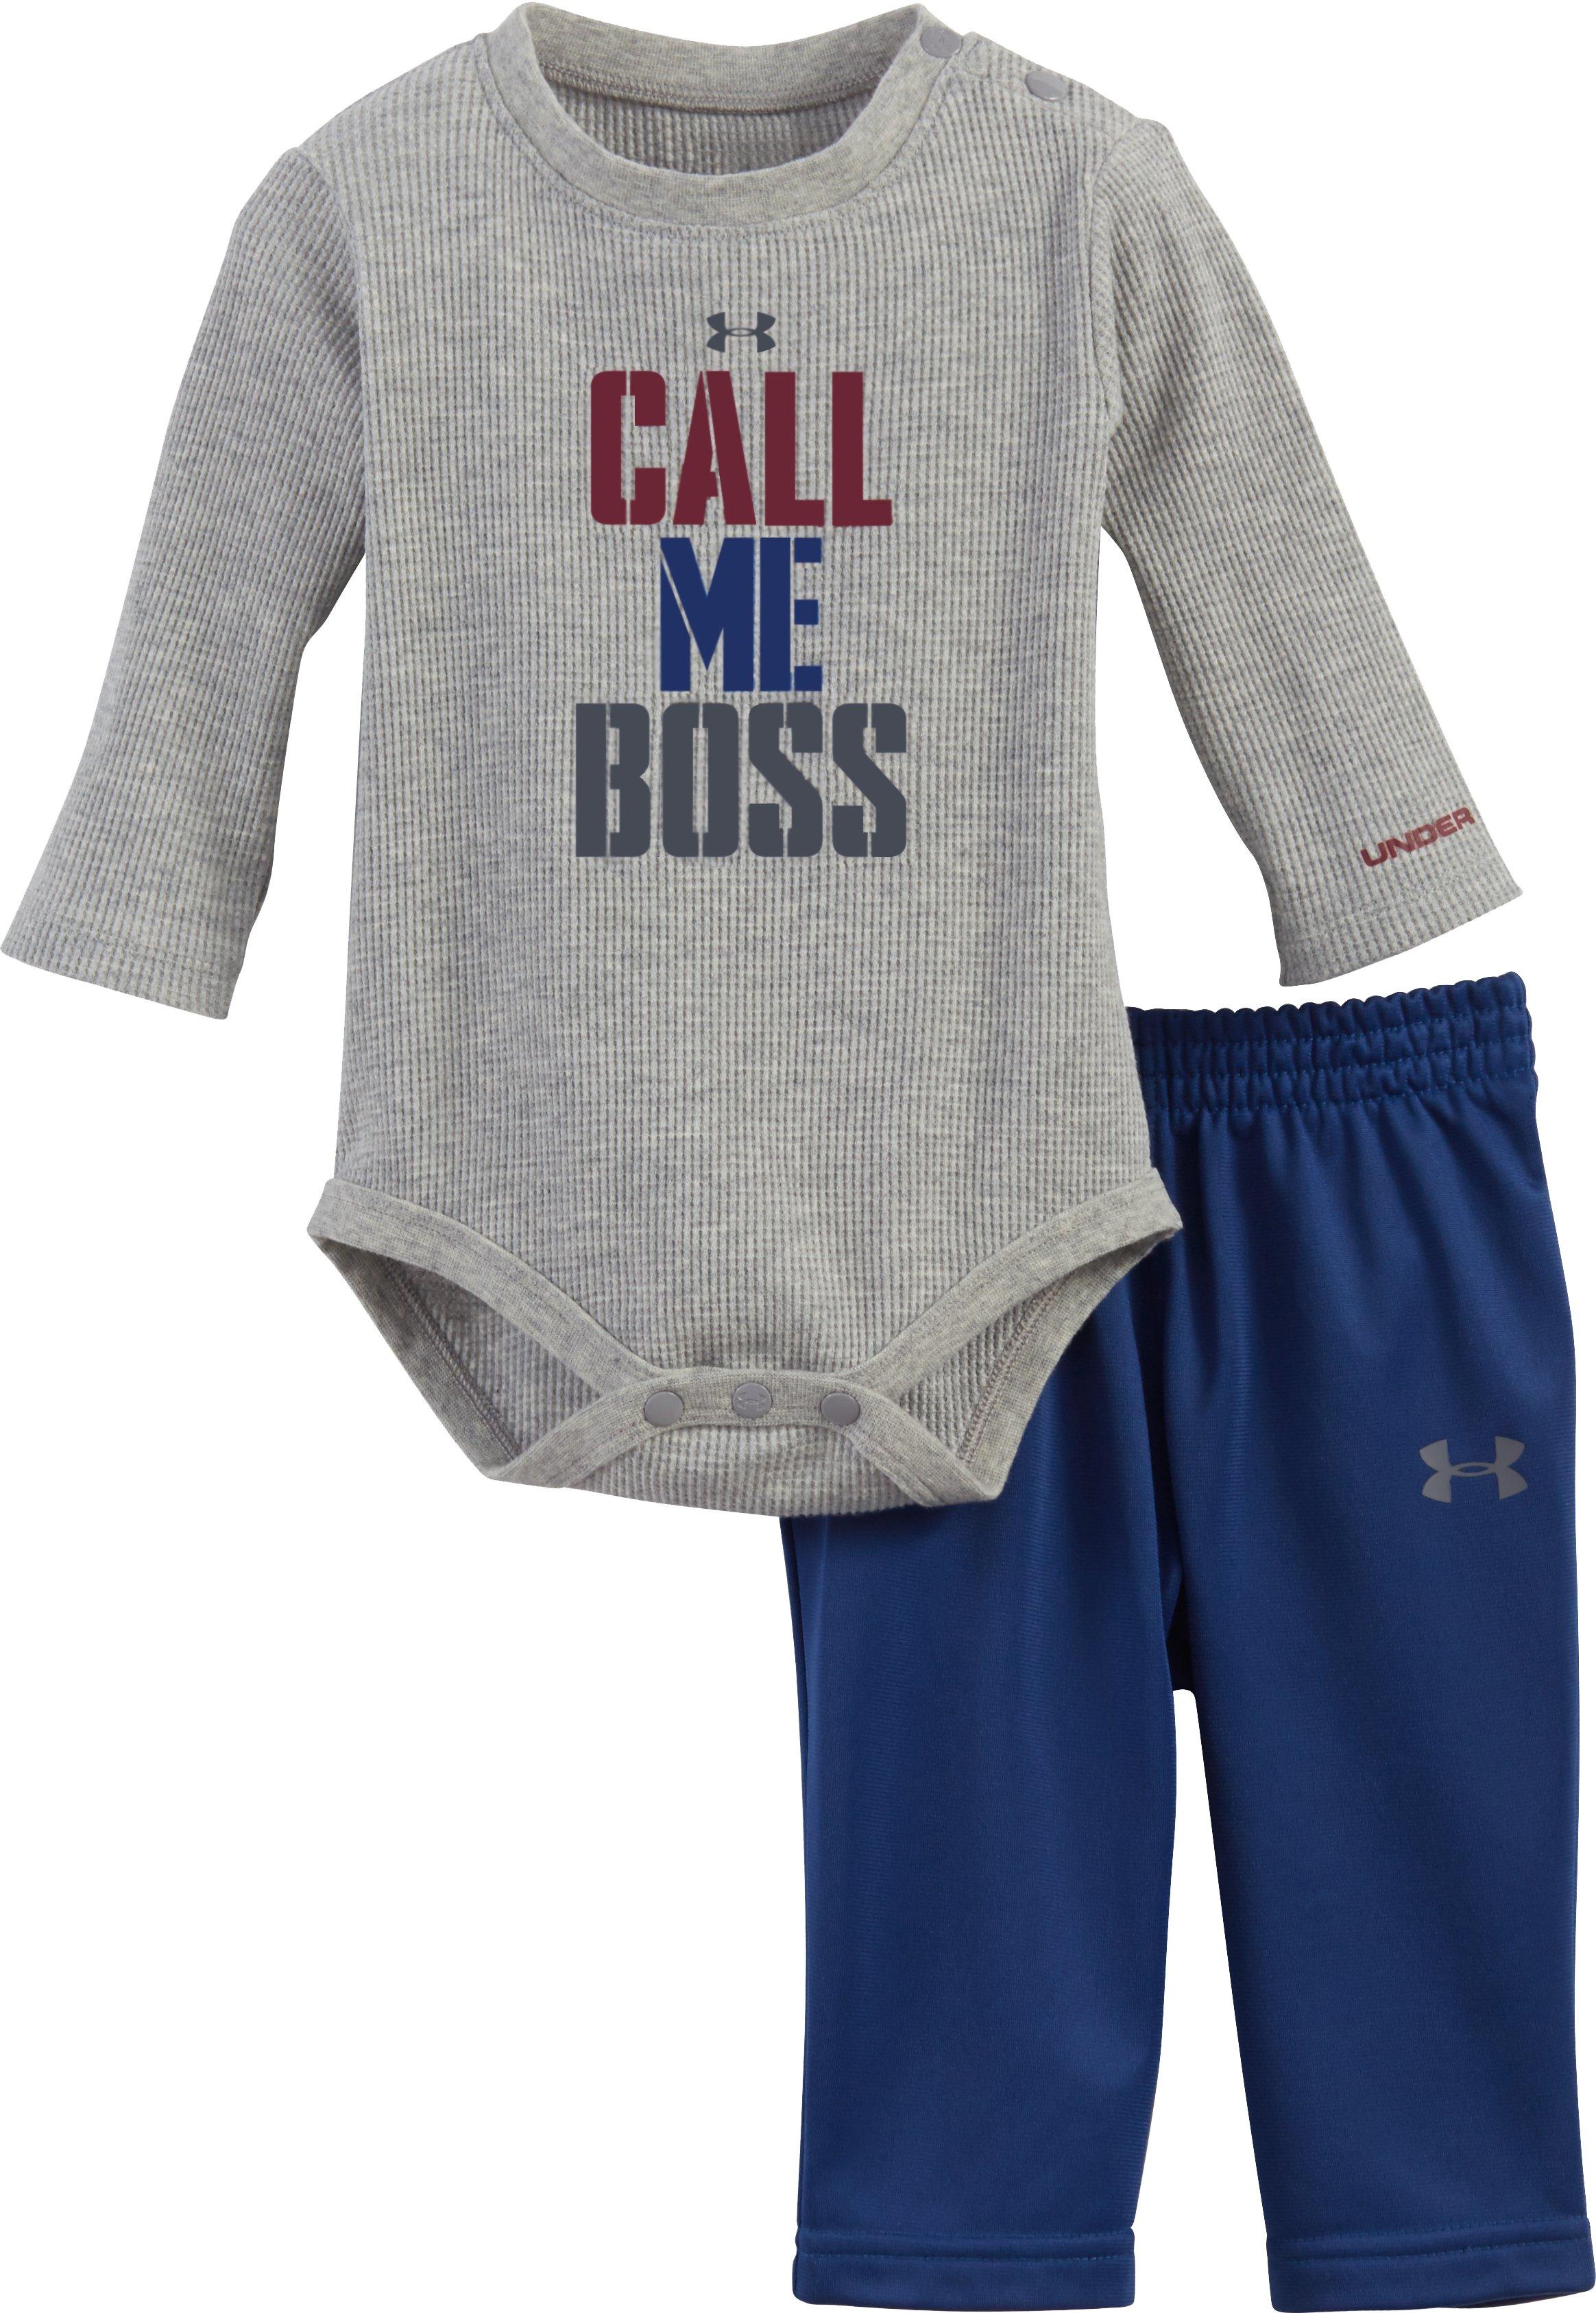 Boys Newborn UA Call Me Boss Set